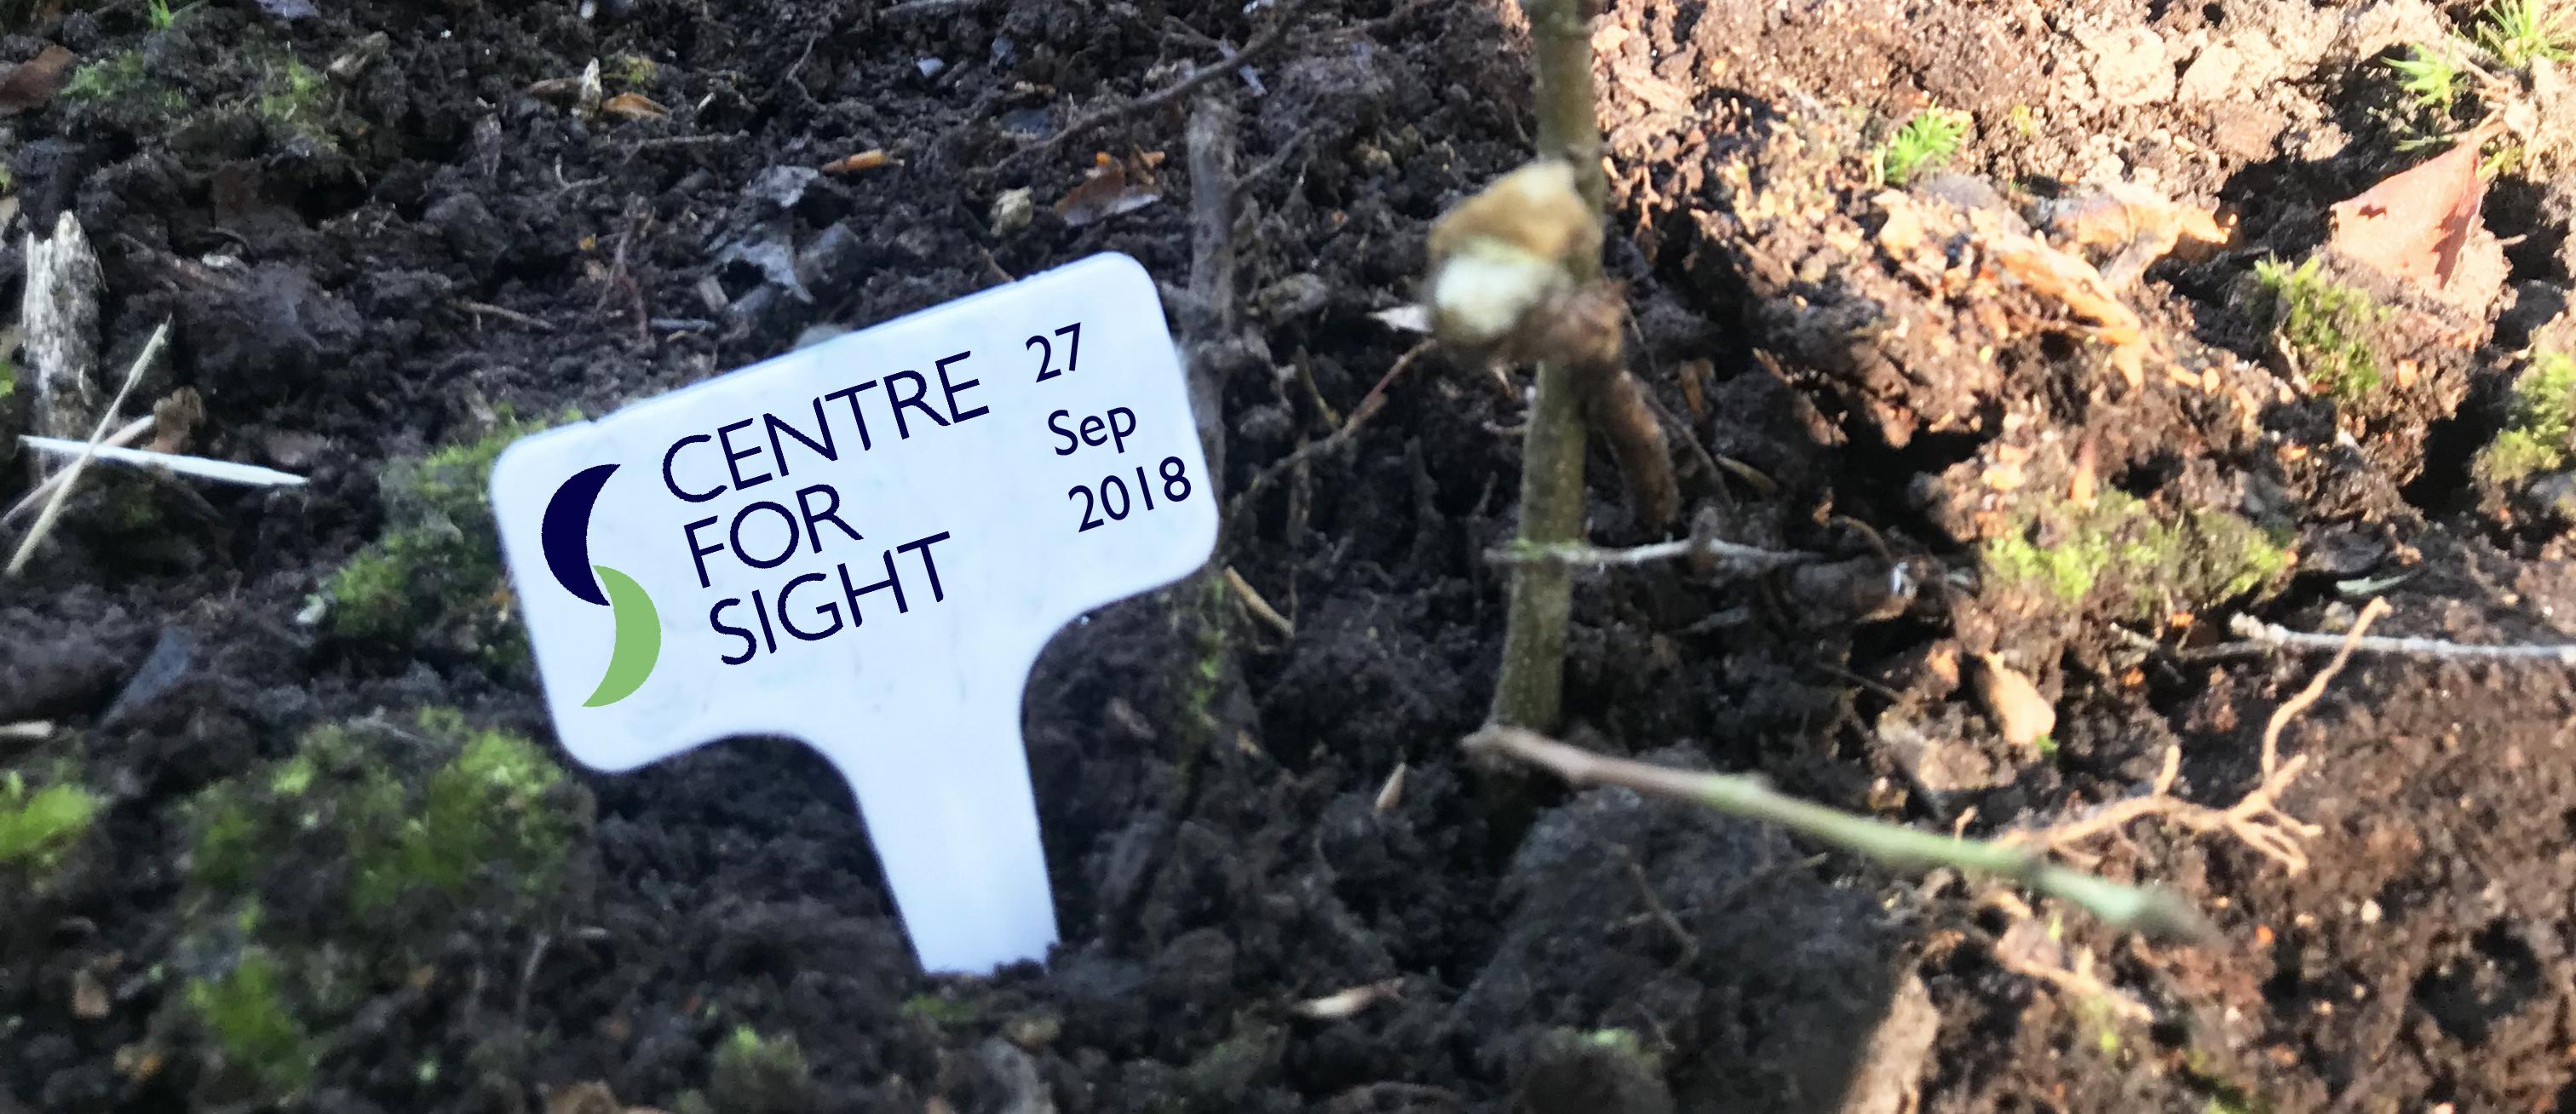 Centre for Sight oak tree plantation